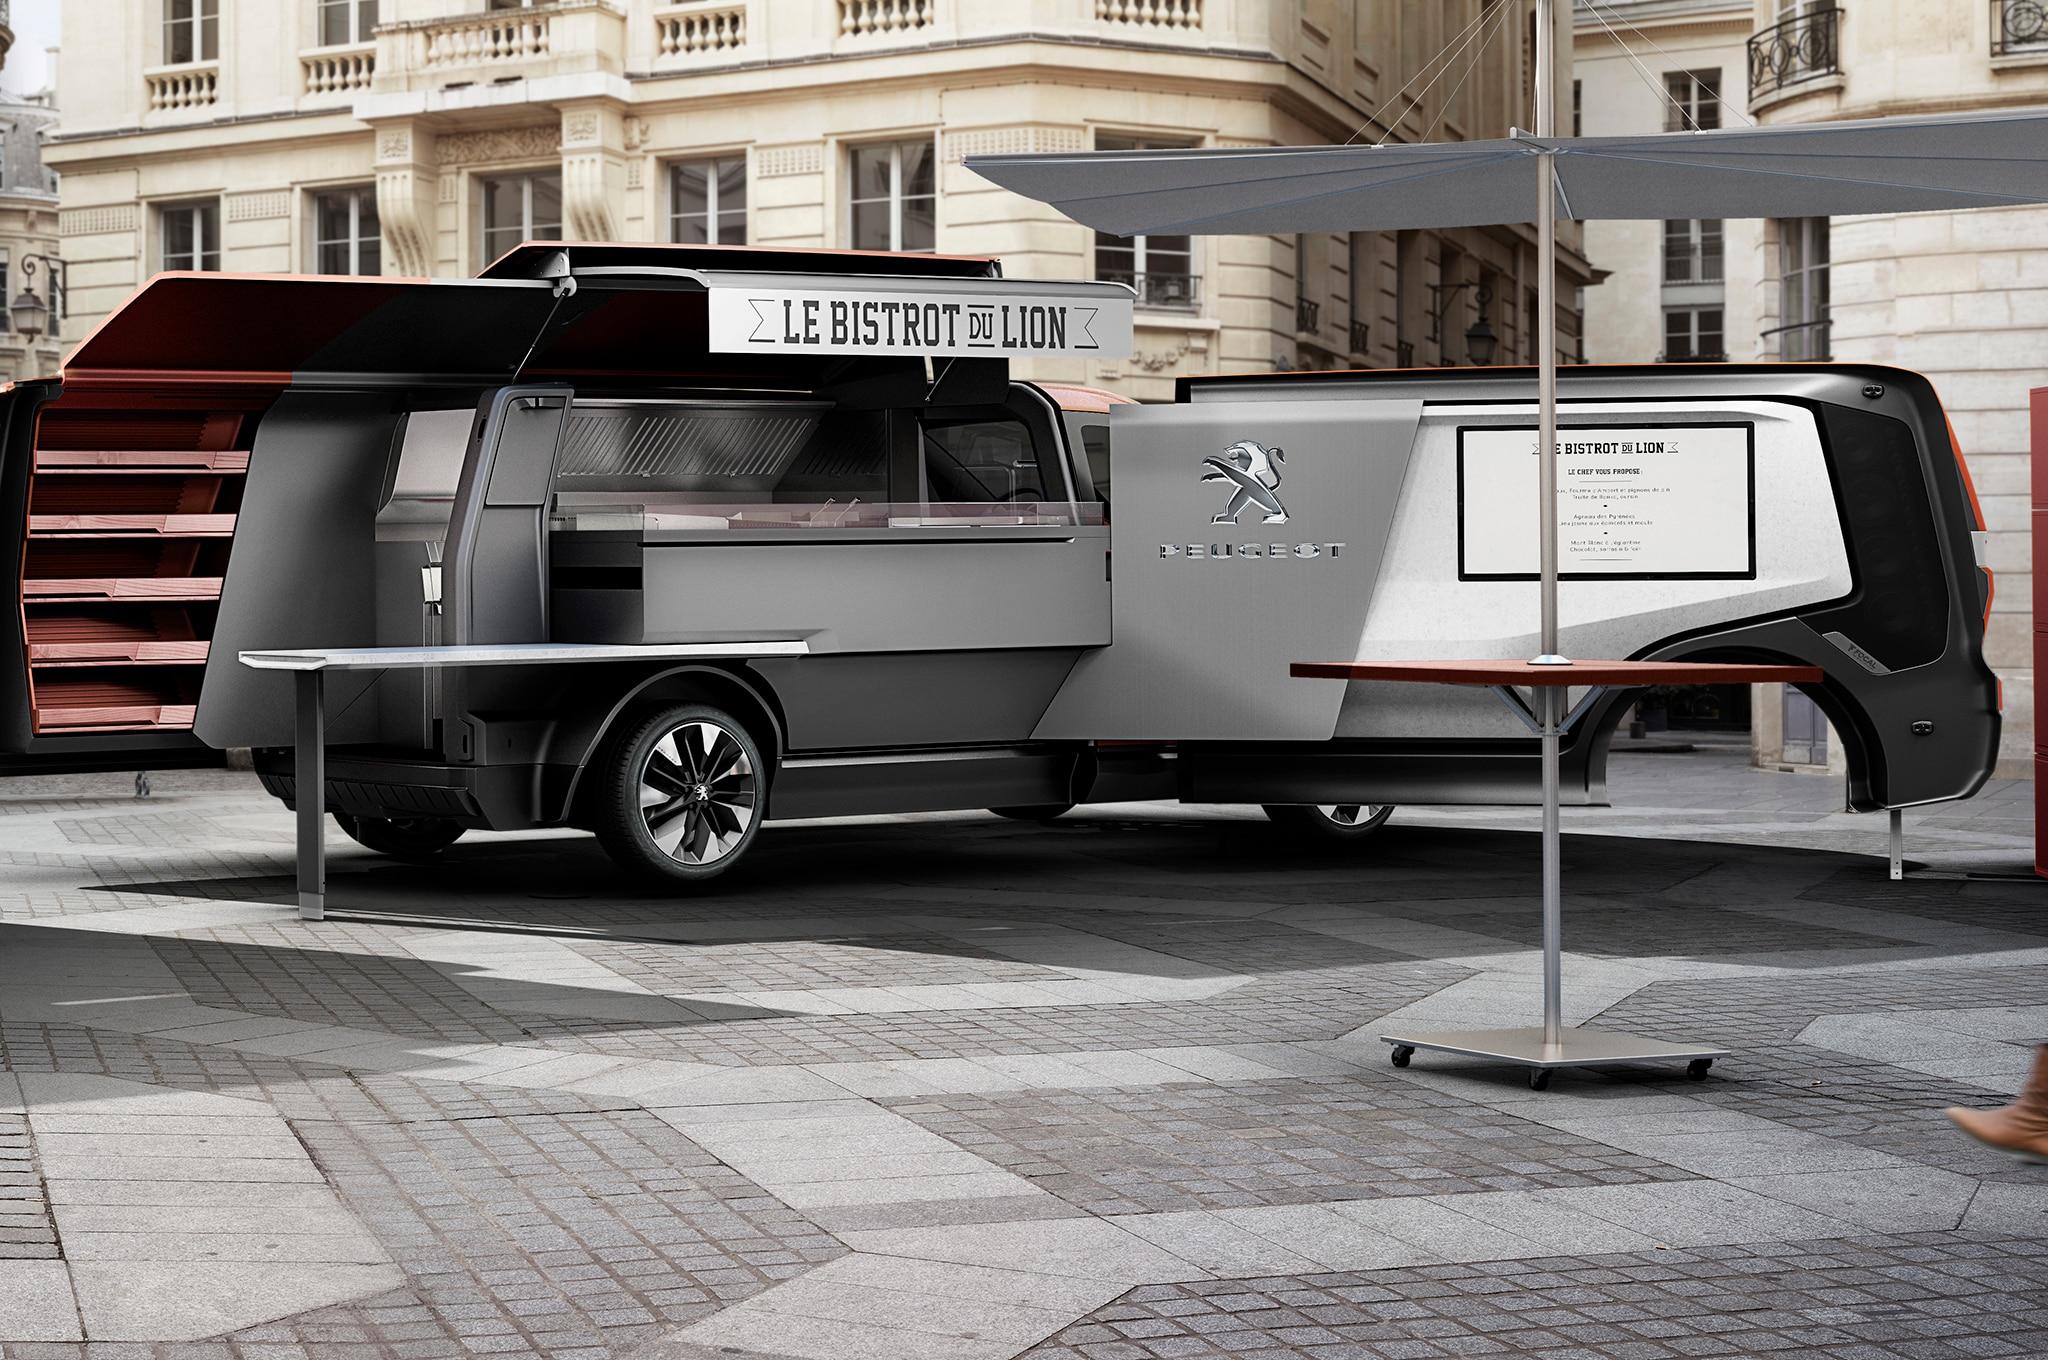 Peugeot Le Bistrot Du Lion Concept Redefines The Food Truck